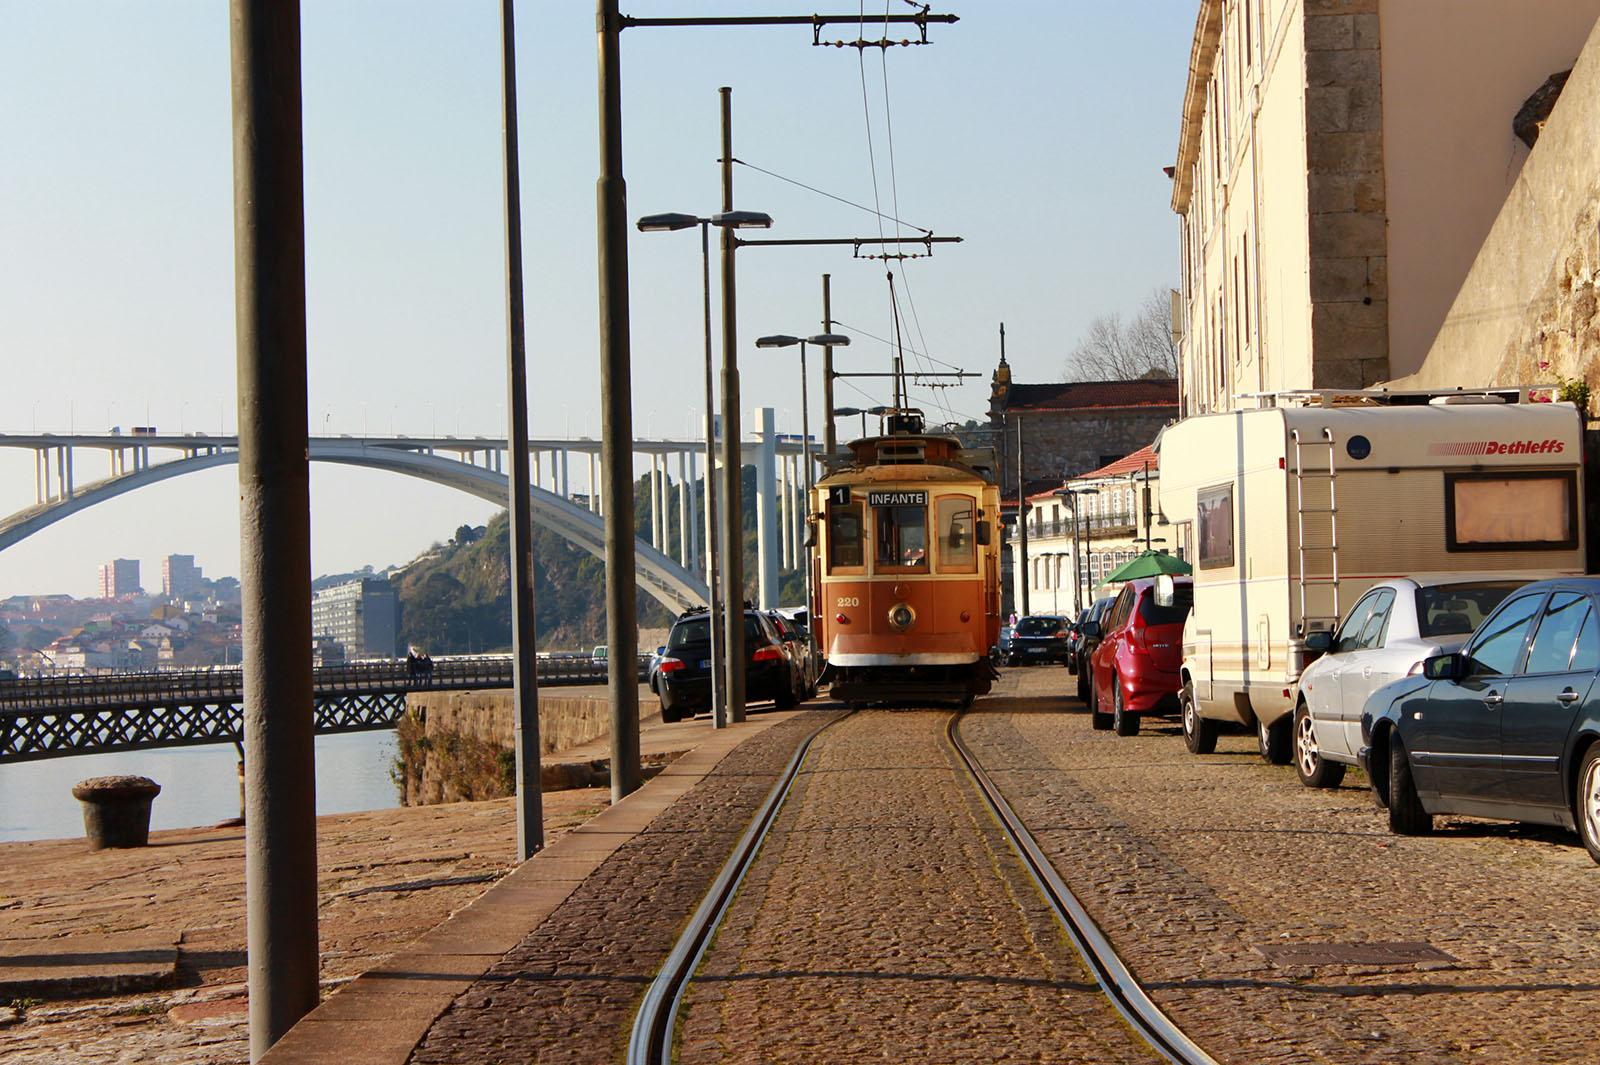 трамвай 1 в порту